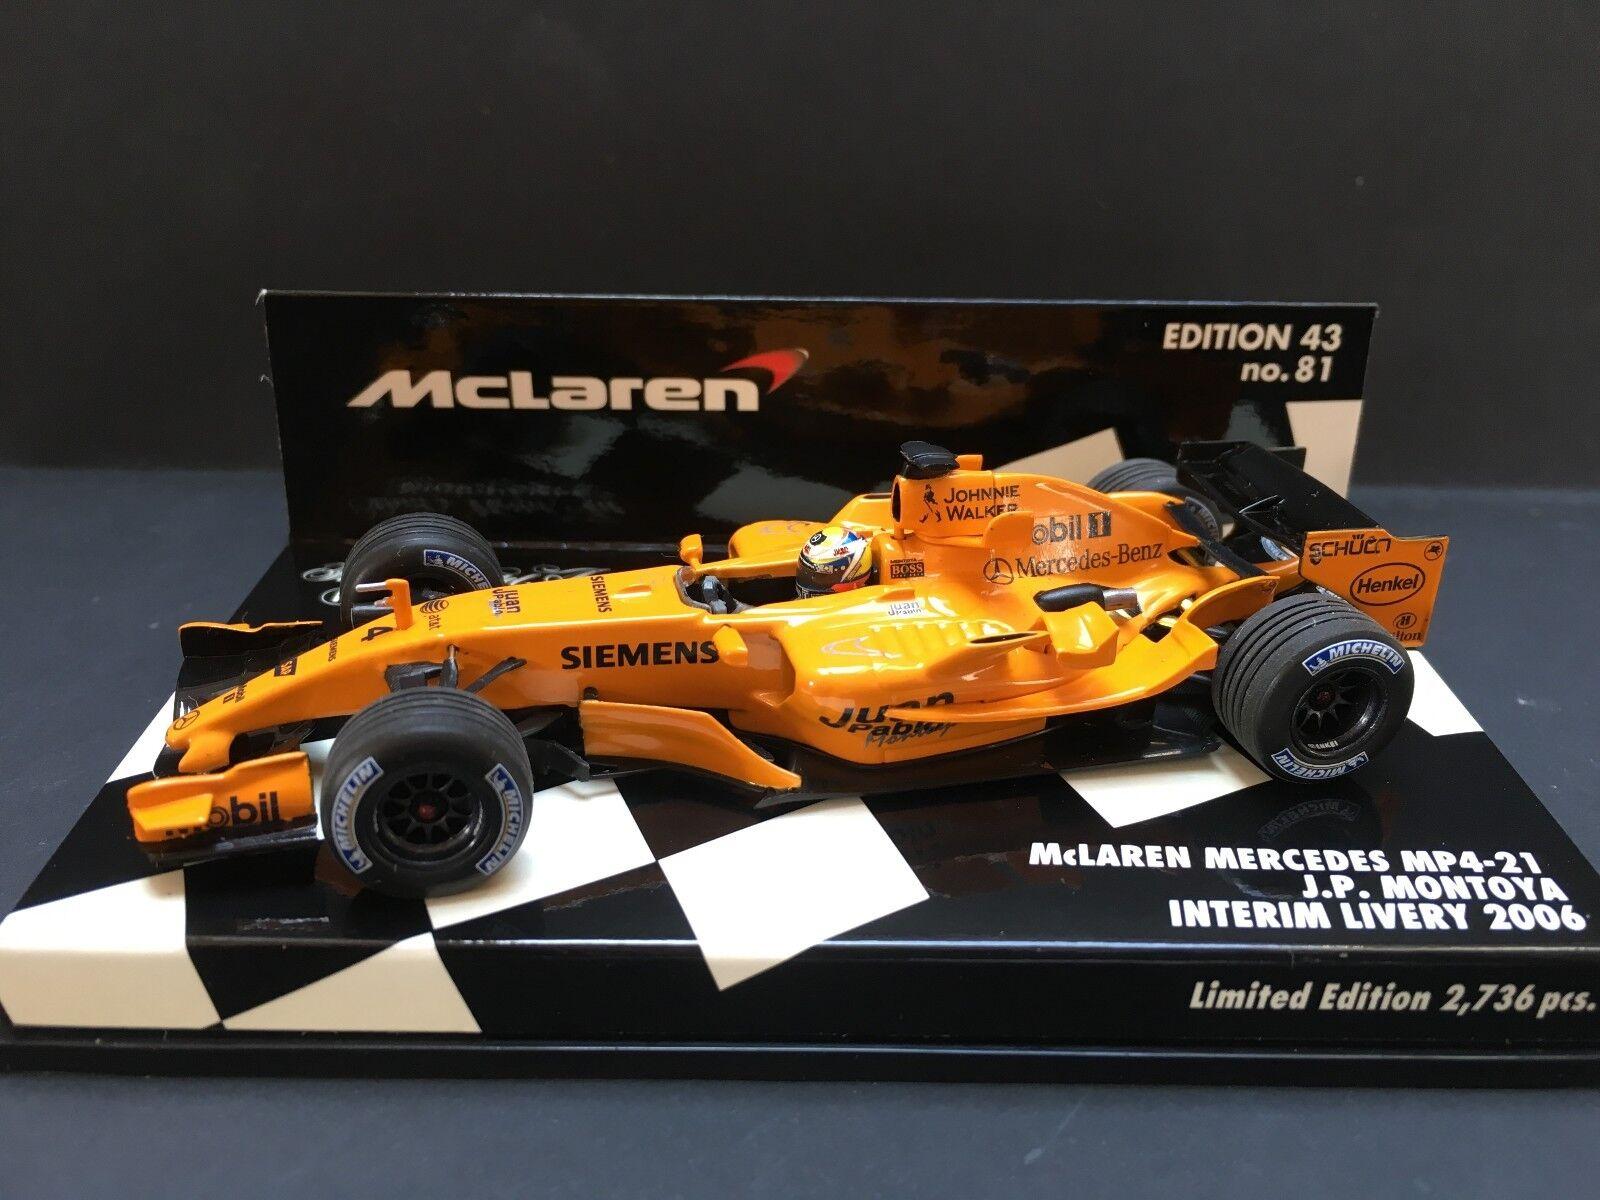 Minichamps - Juan Pablo Montoya - McLaren - Mp4 21 - 2006 -1 43 - Interim Livery